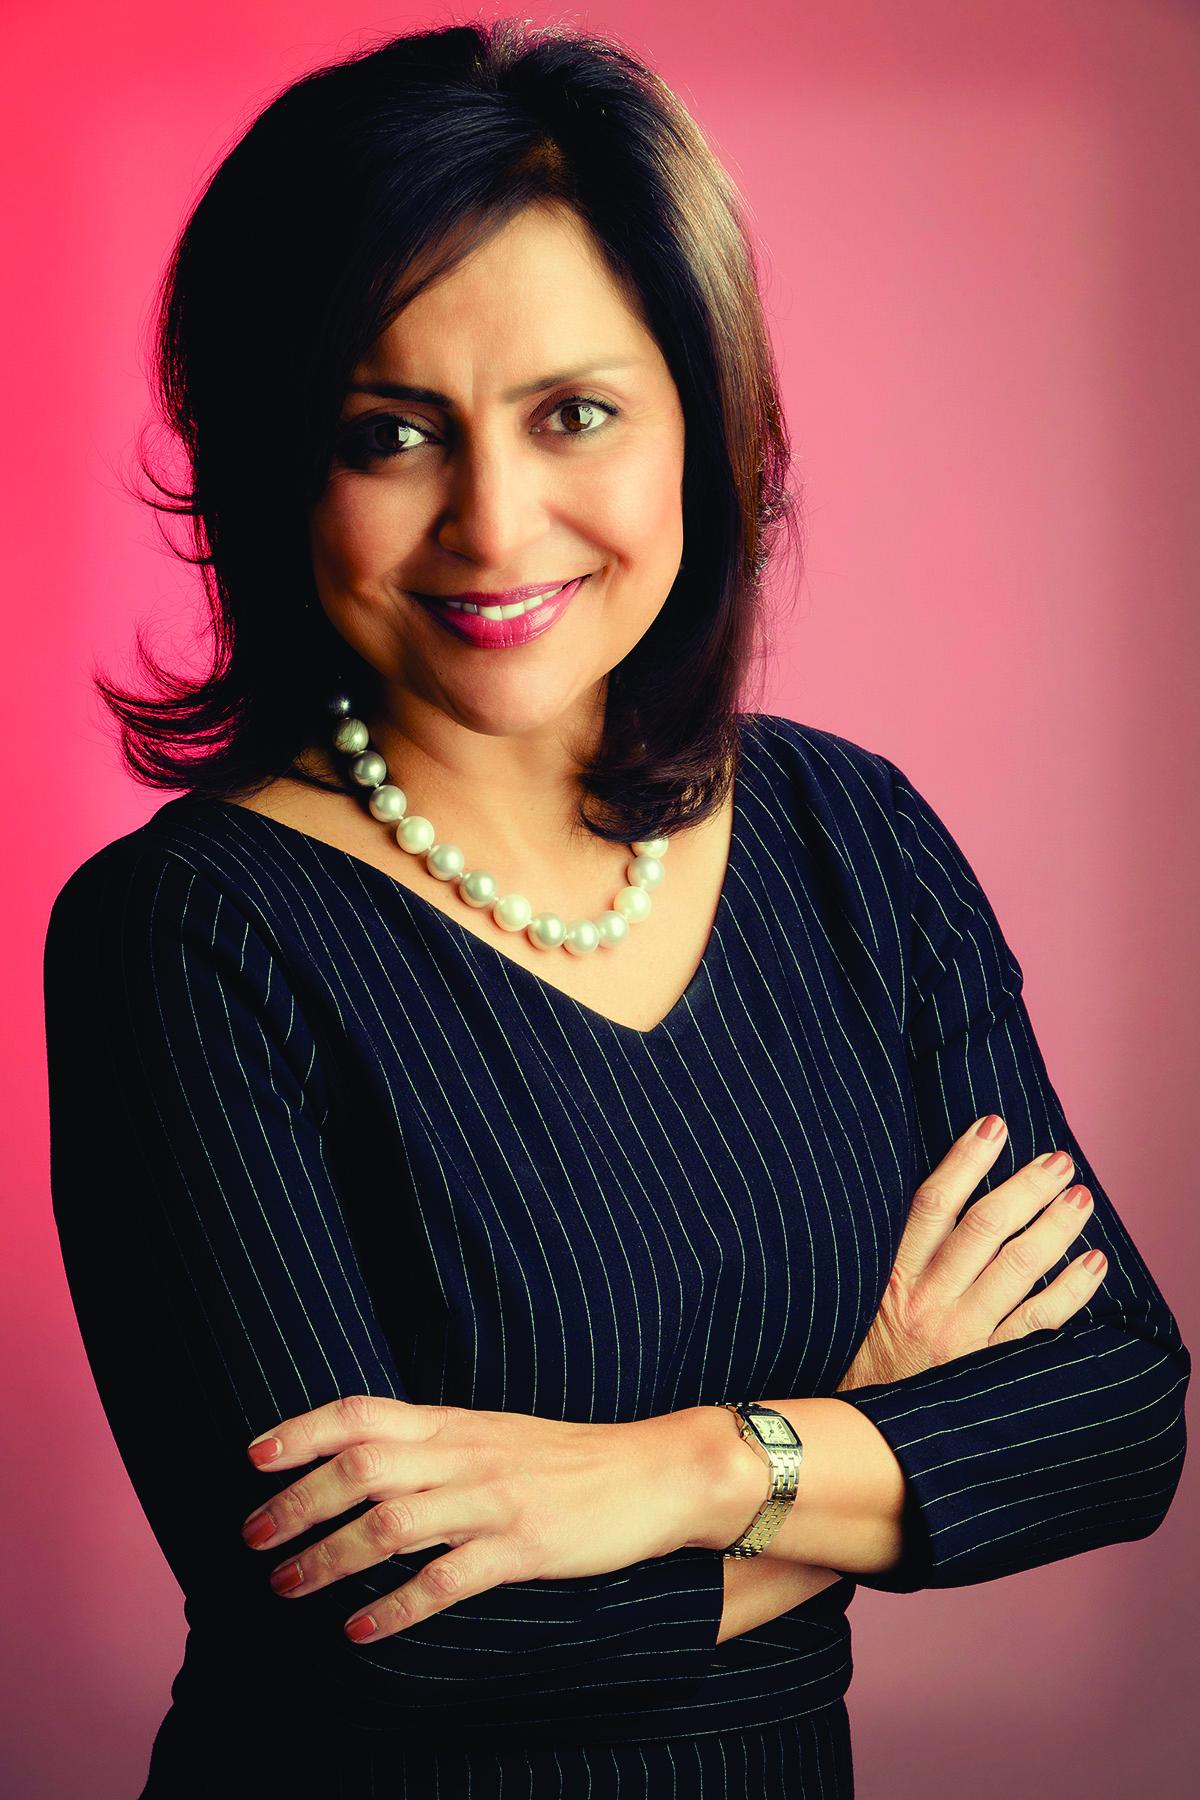 Sujata Chaudhry '88